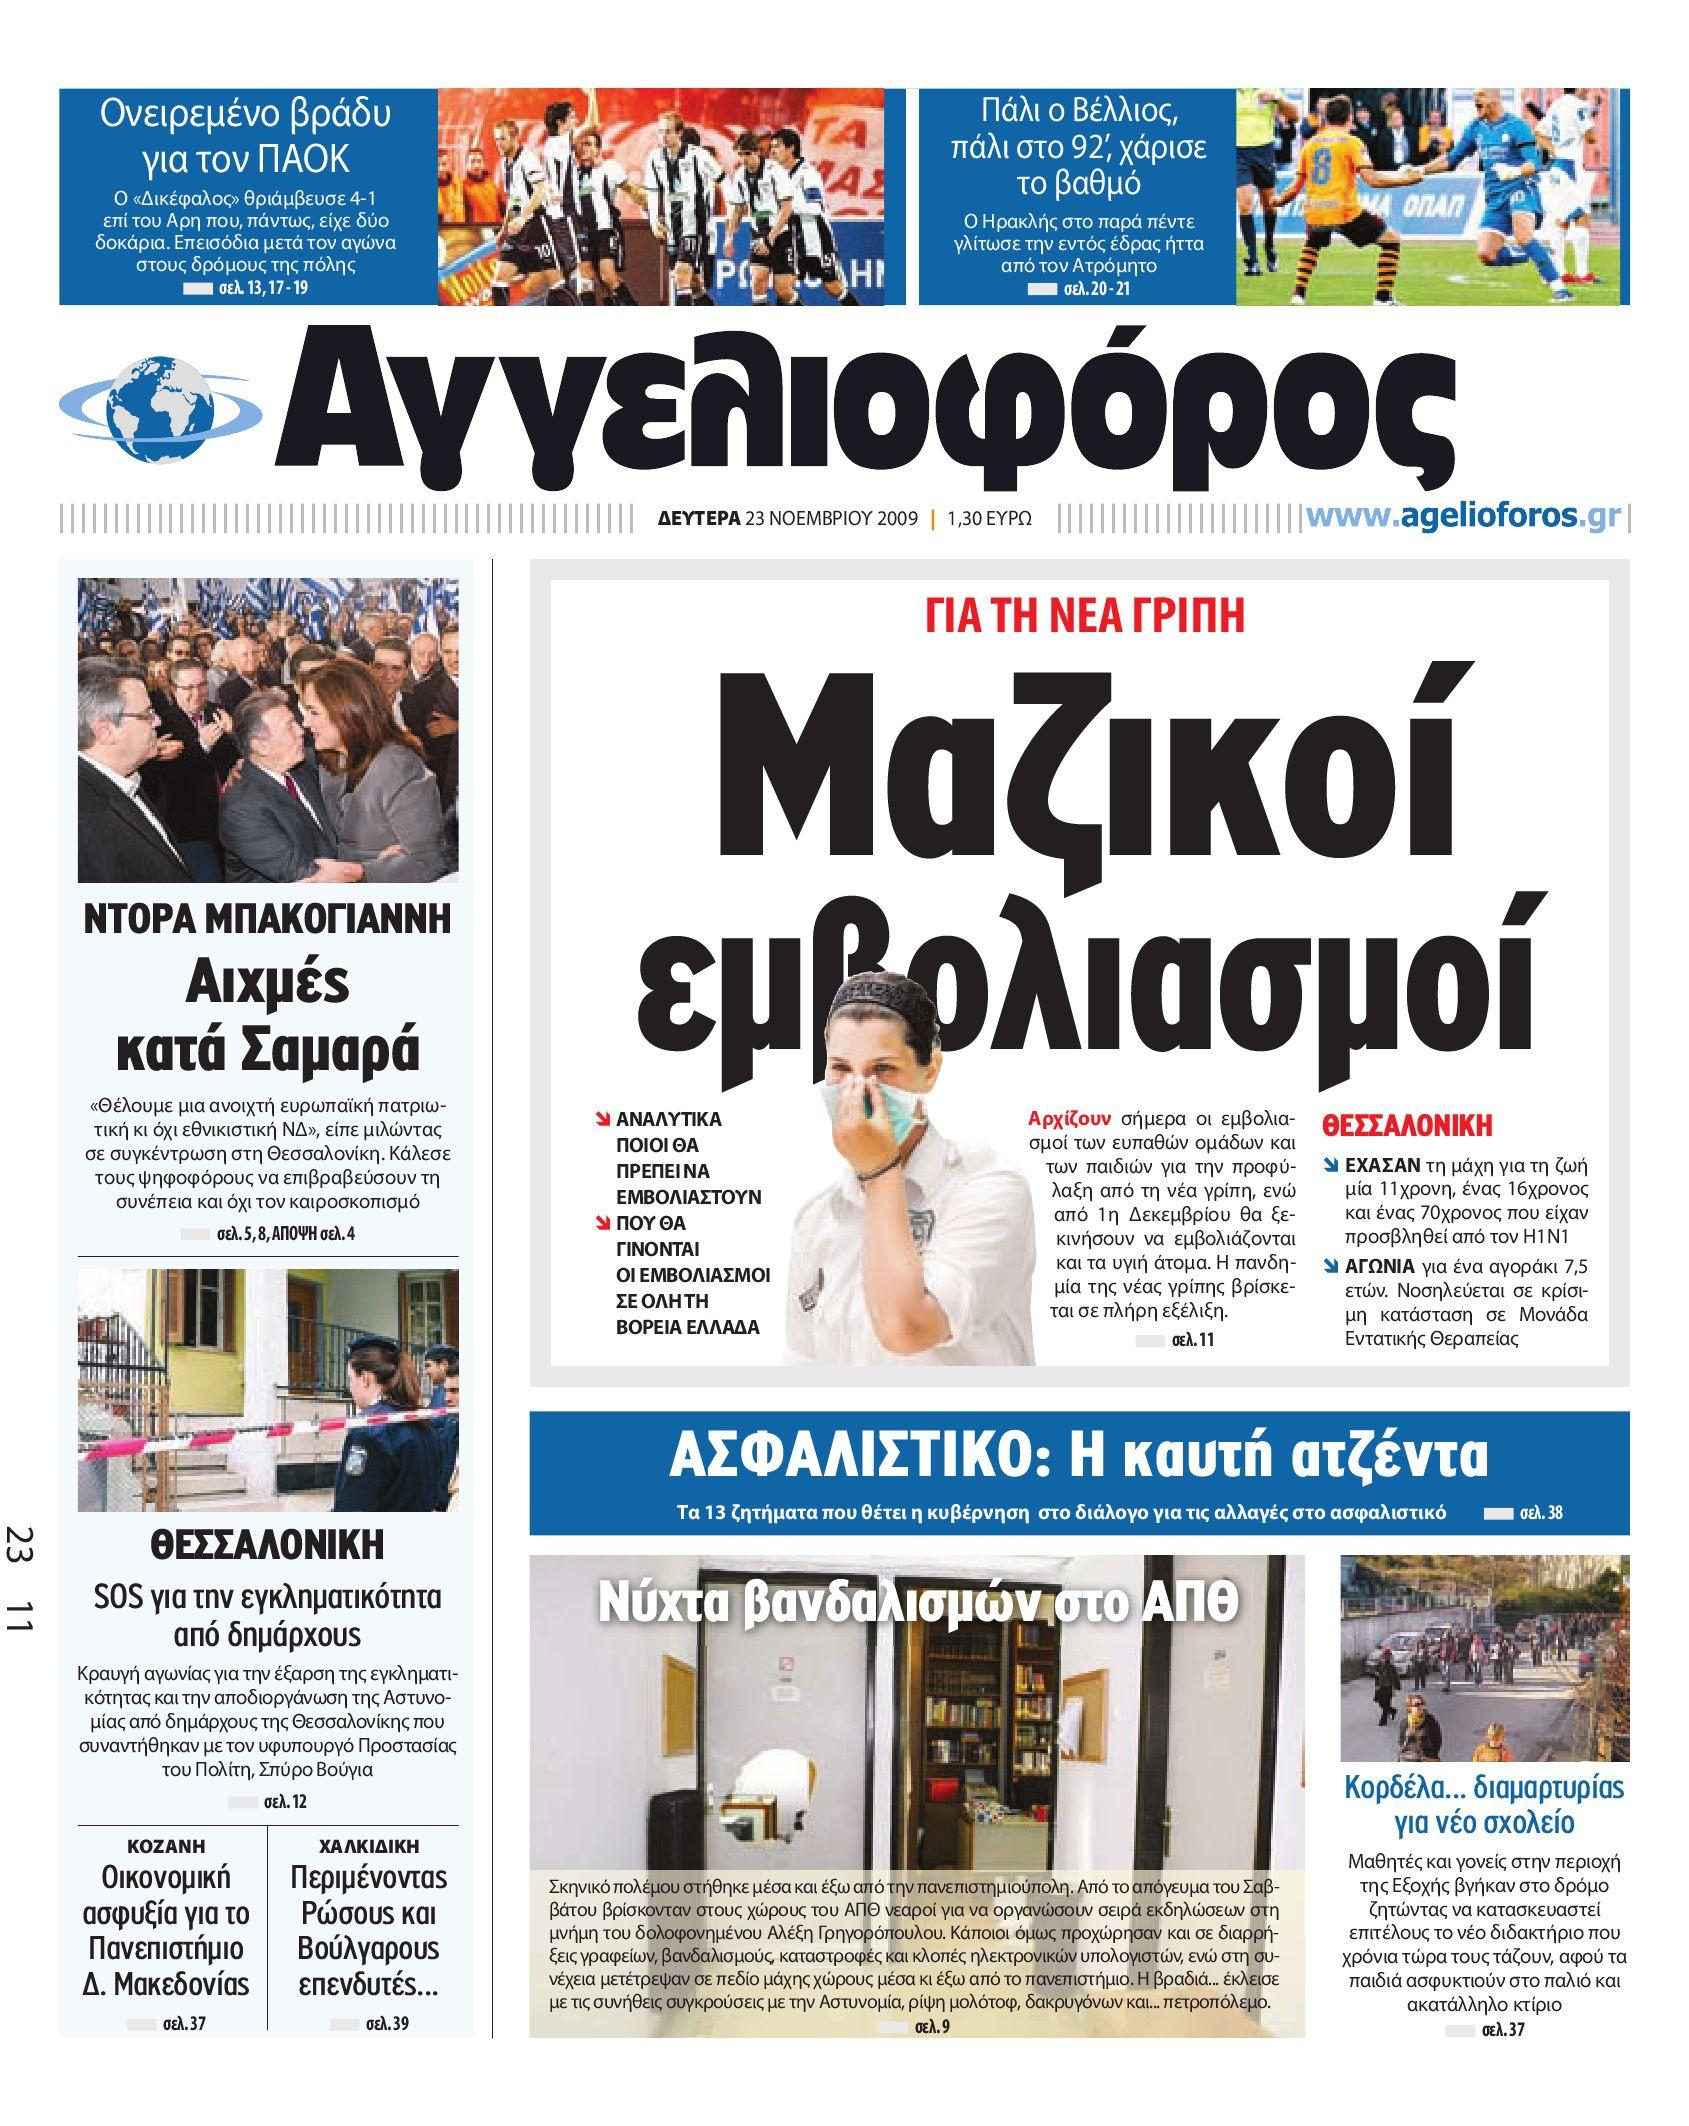 a84c0c50695b ΑΓΓΕΛΙΟΦΟΡΟΣ 23 11 2009 by Εκδοτική Βορείου Ελλάδος Α.Ε. - issuu